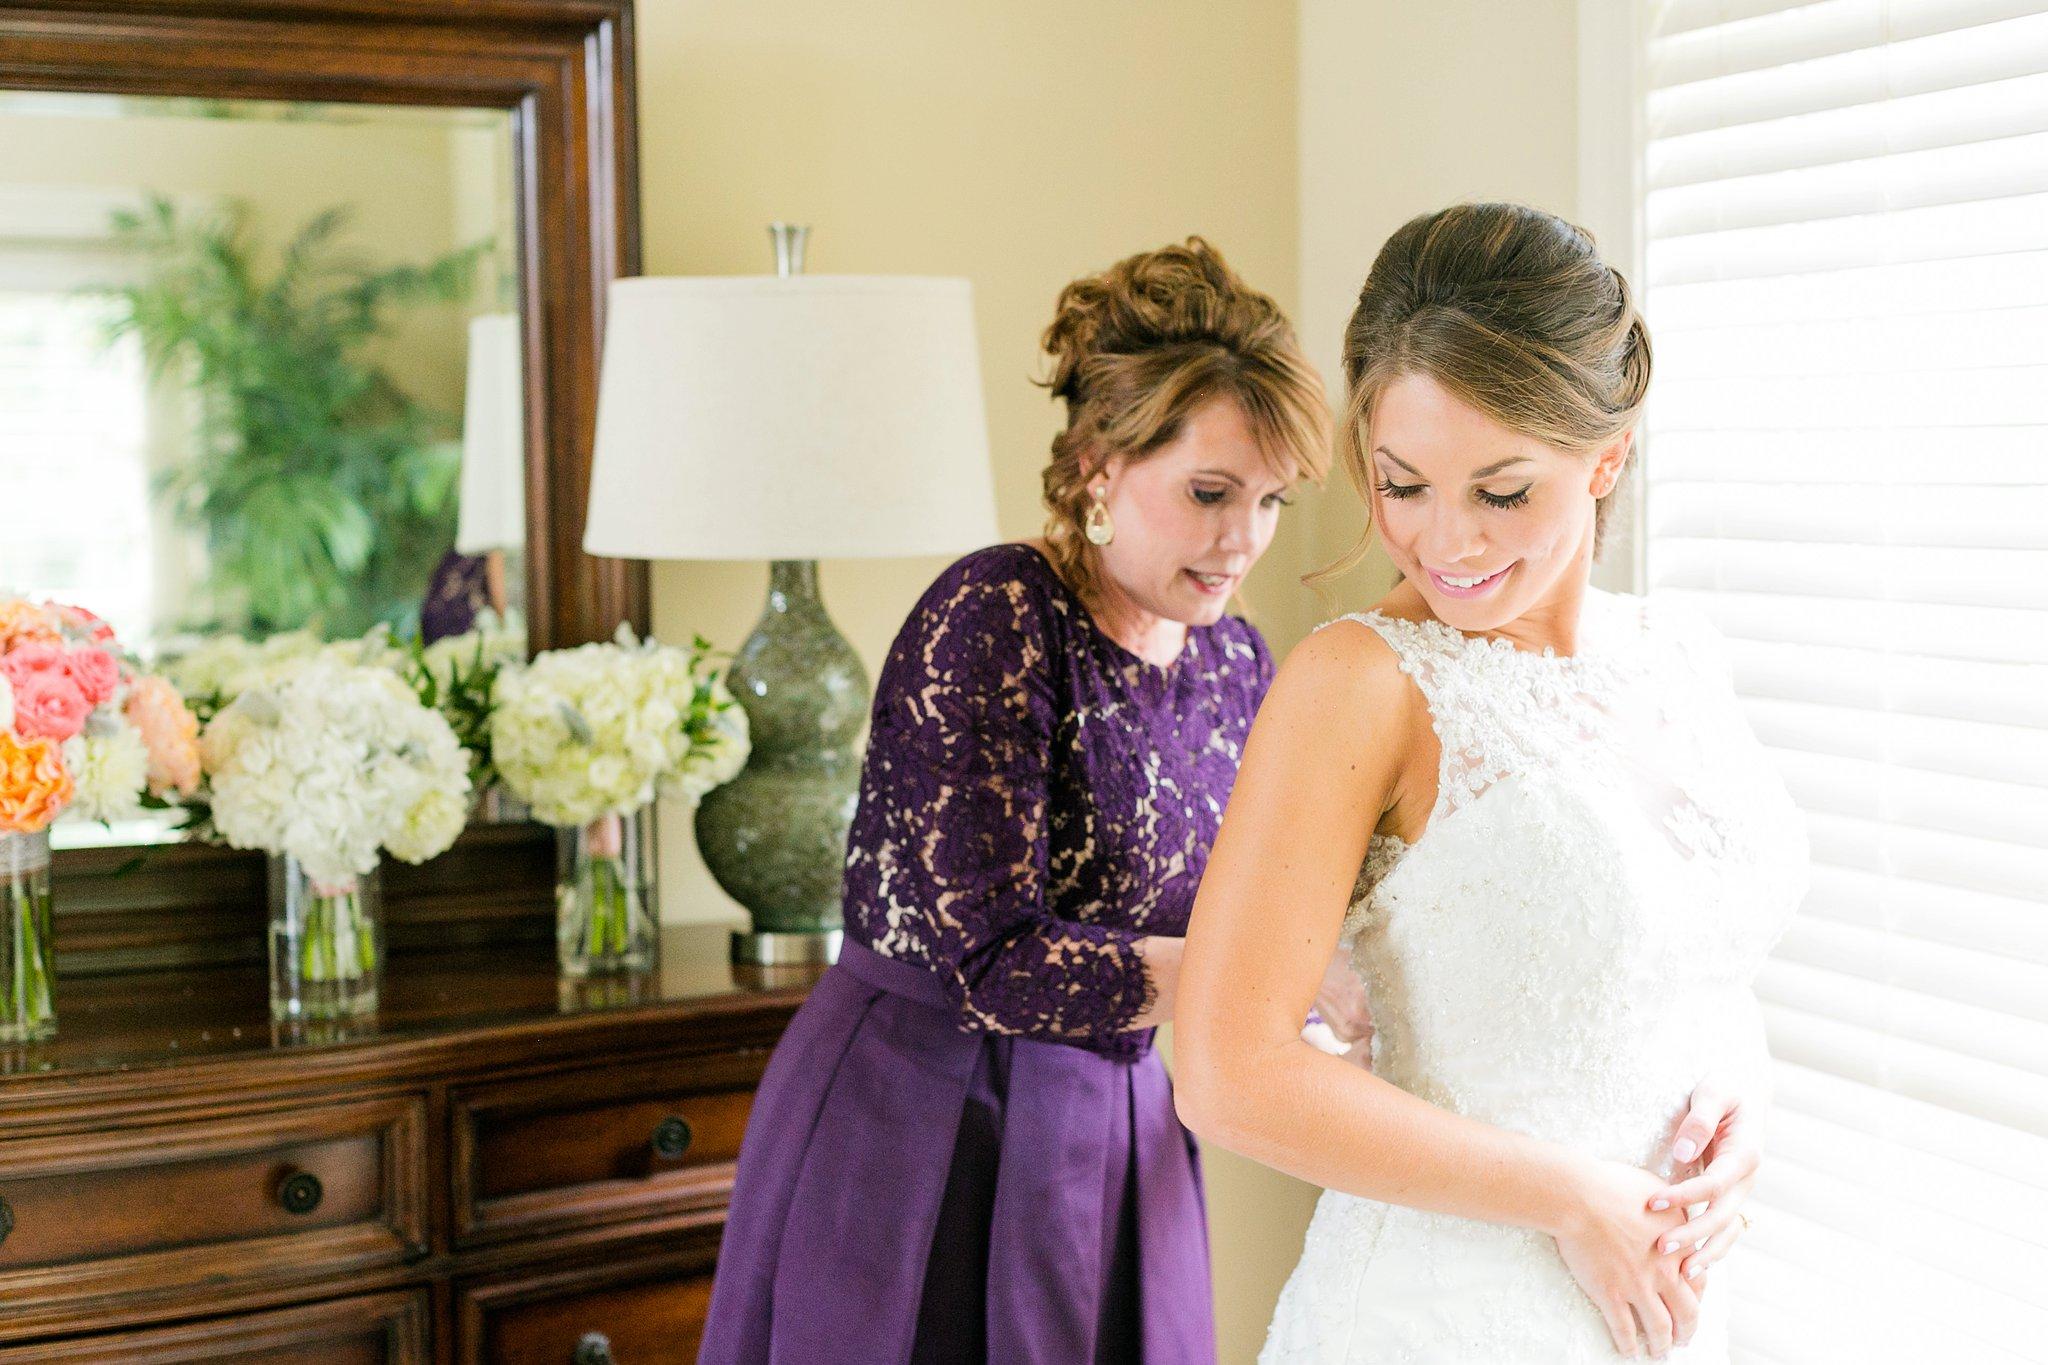 Stone Tower Winery Wedding Photos Virginia Wedding Photographer Megan Kelsey Photography Sam & Angela-38.jpg